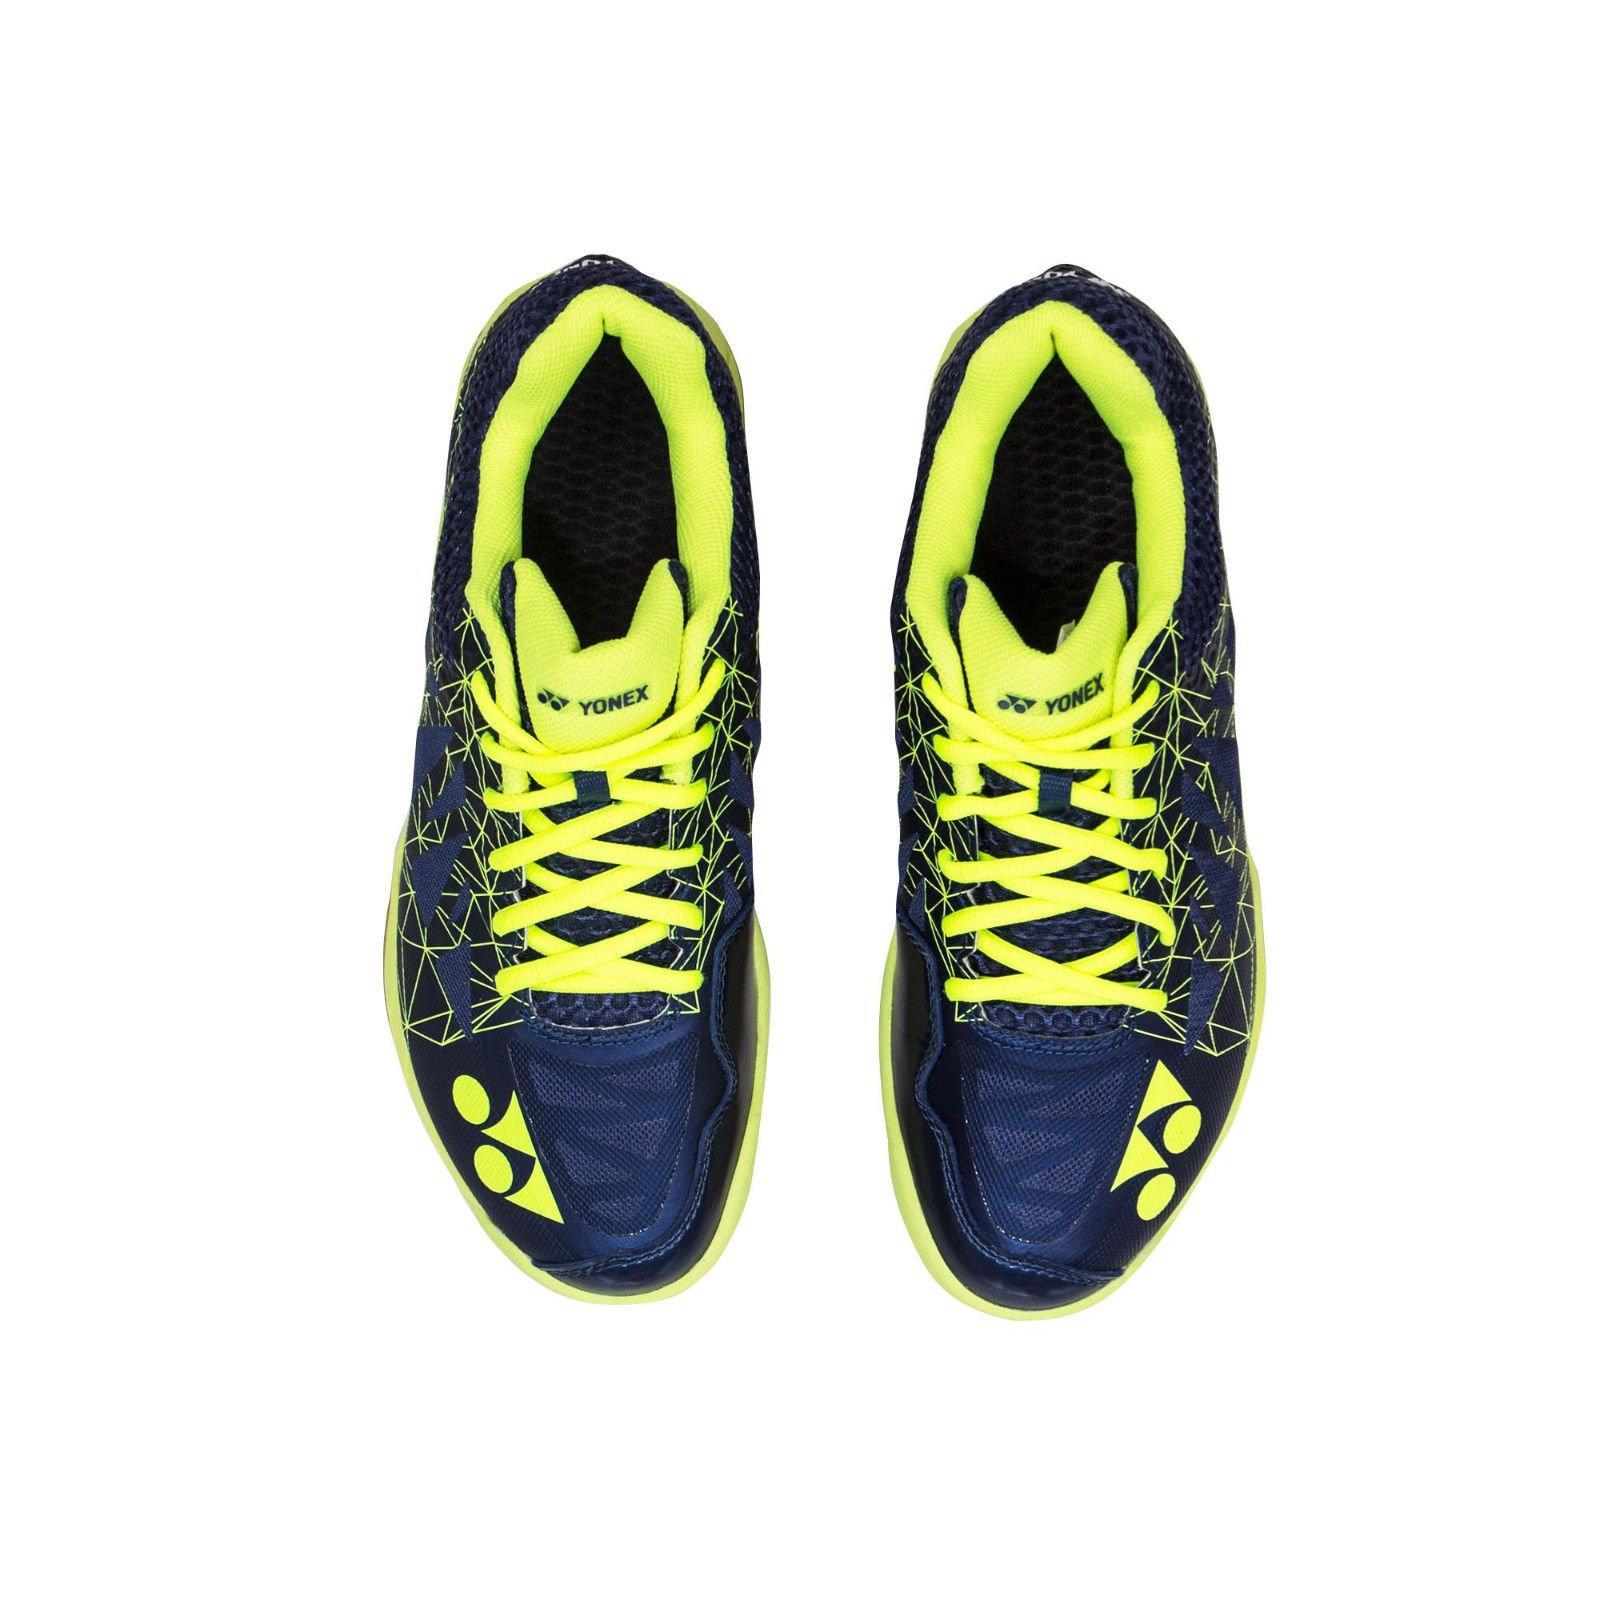 Yonex Aerus 2 Men's Indoor Court Shoe Navy (8.5) by Yonex (Image #1)